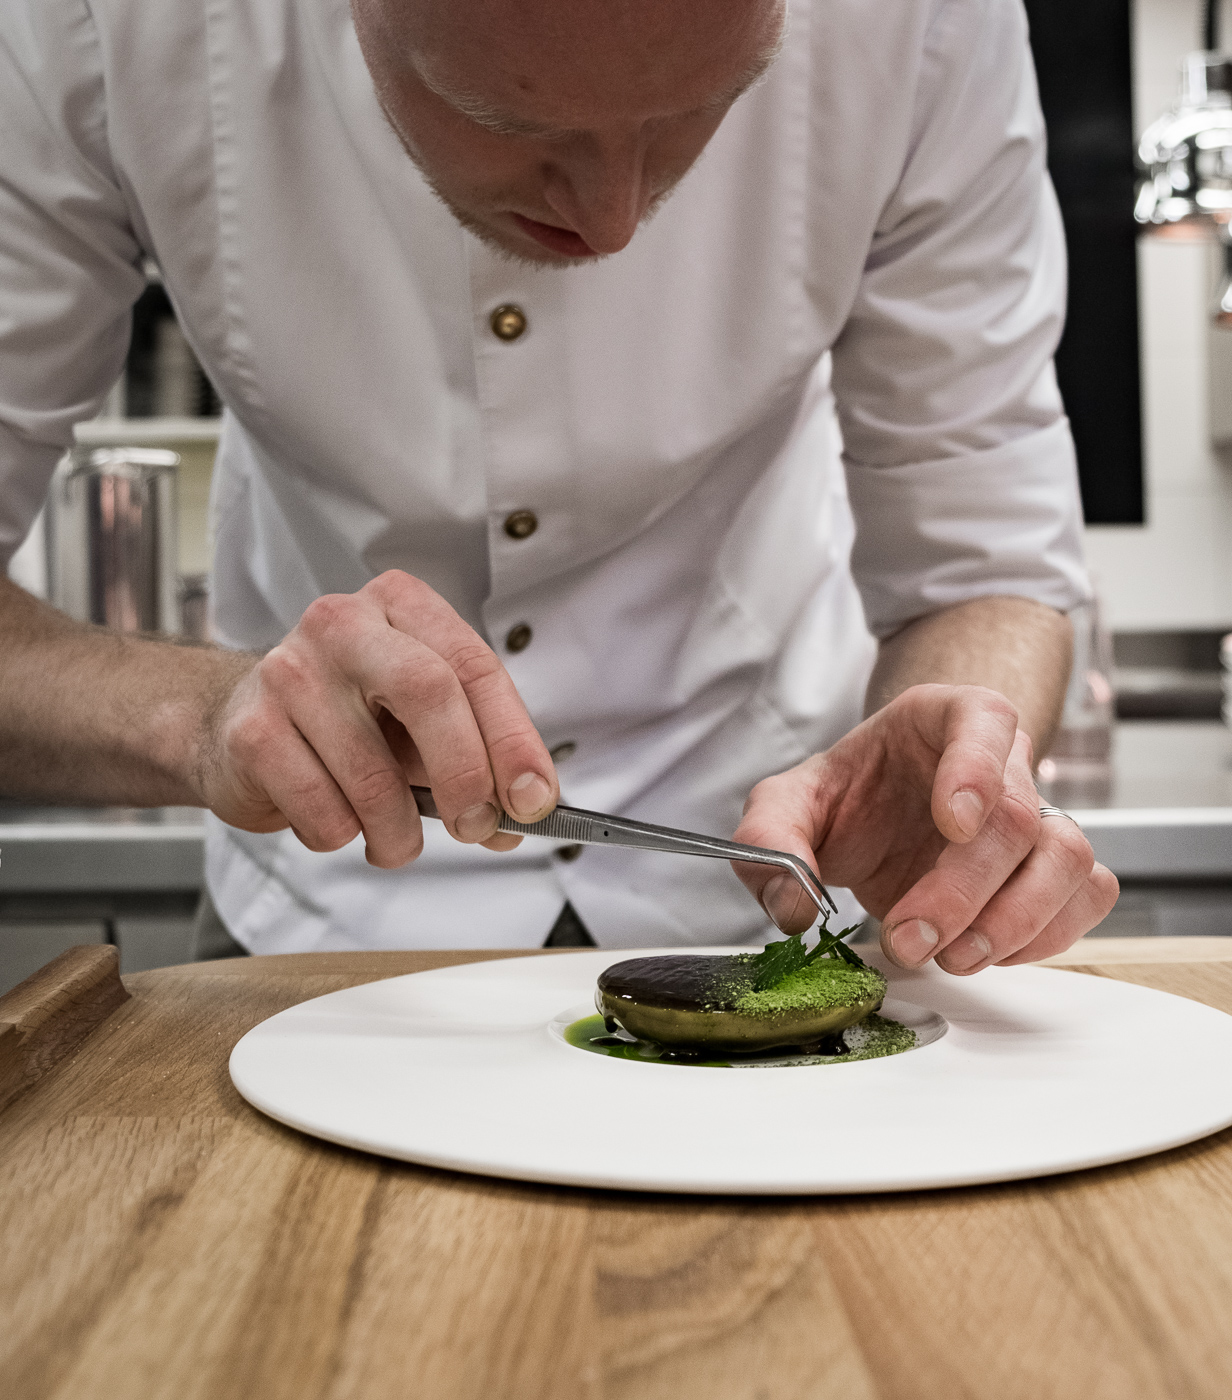 tooktook-photography-gastronomy-food-beverages-experiences-restaurants-47.jpg